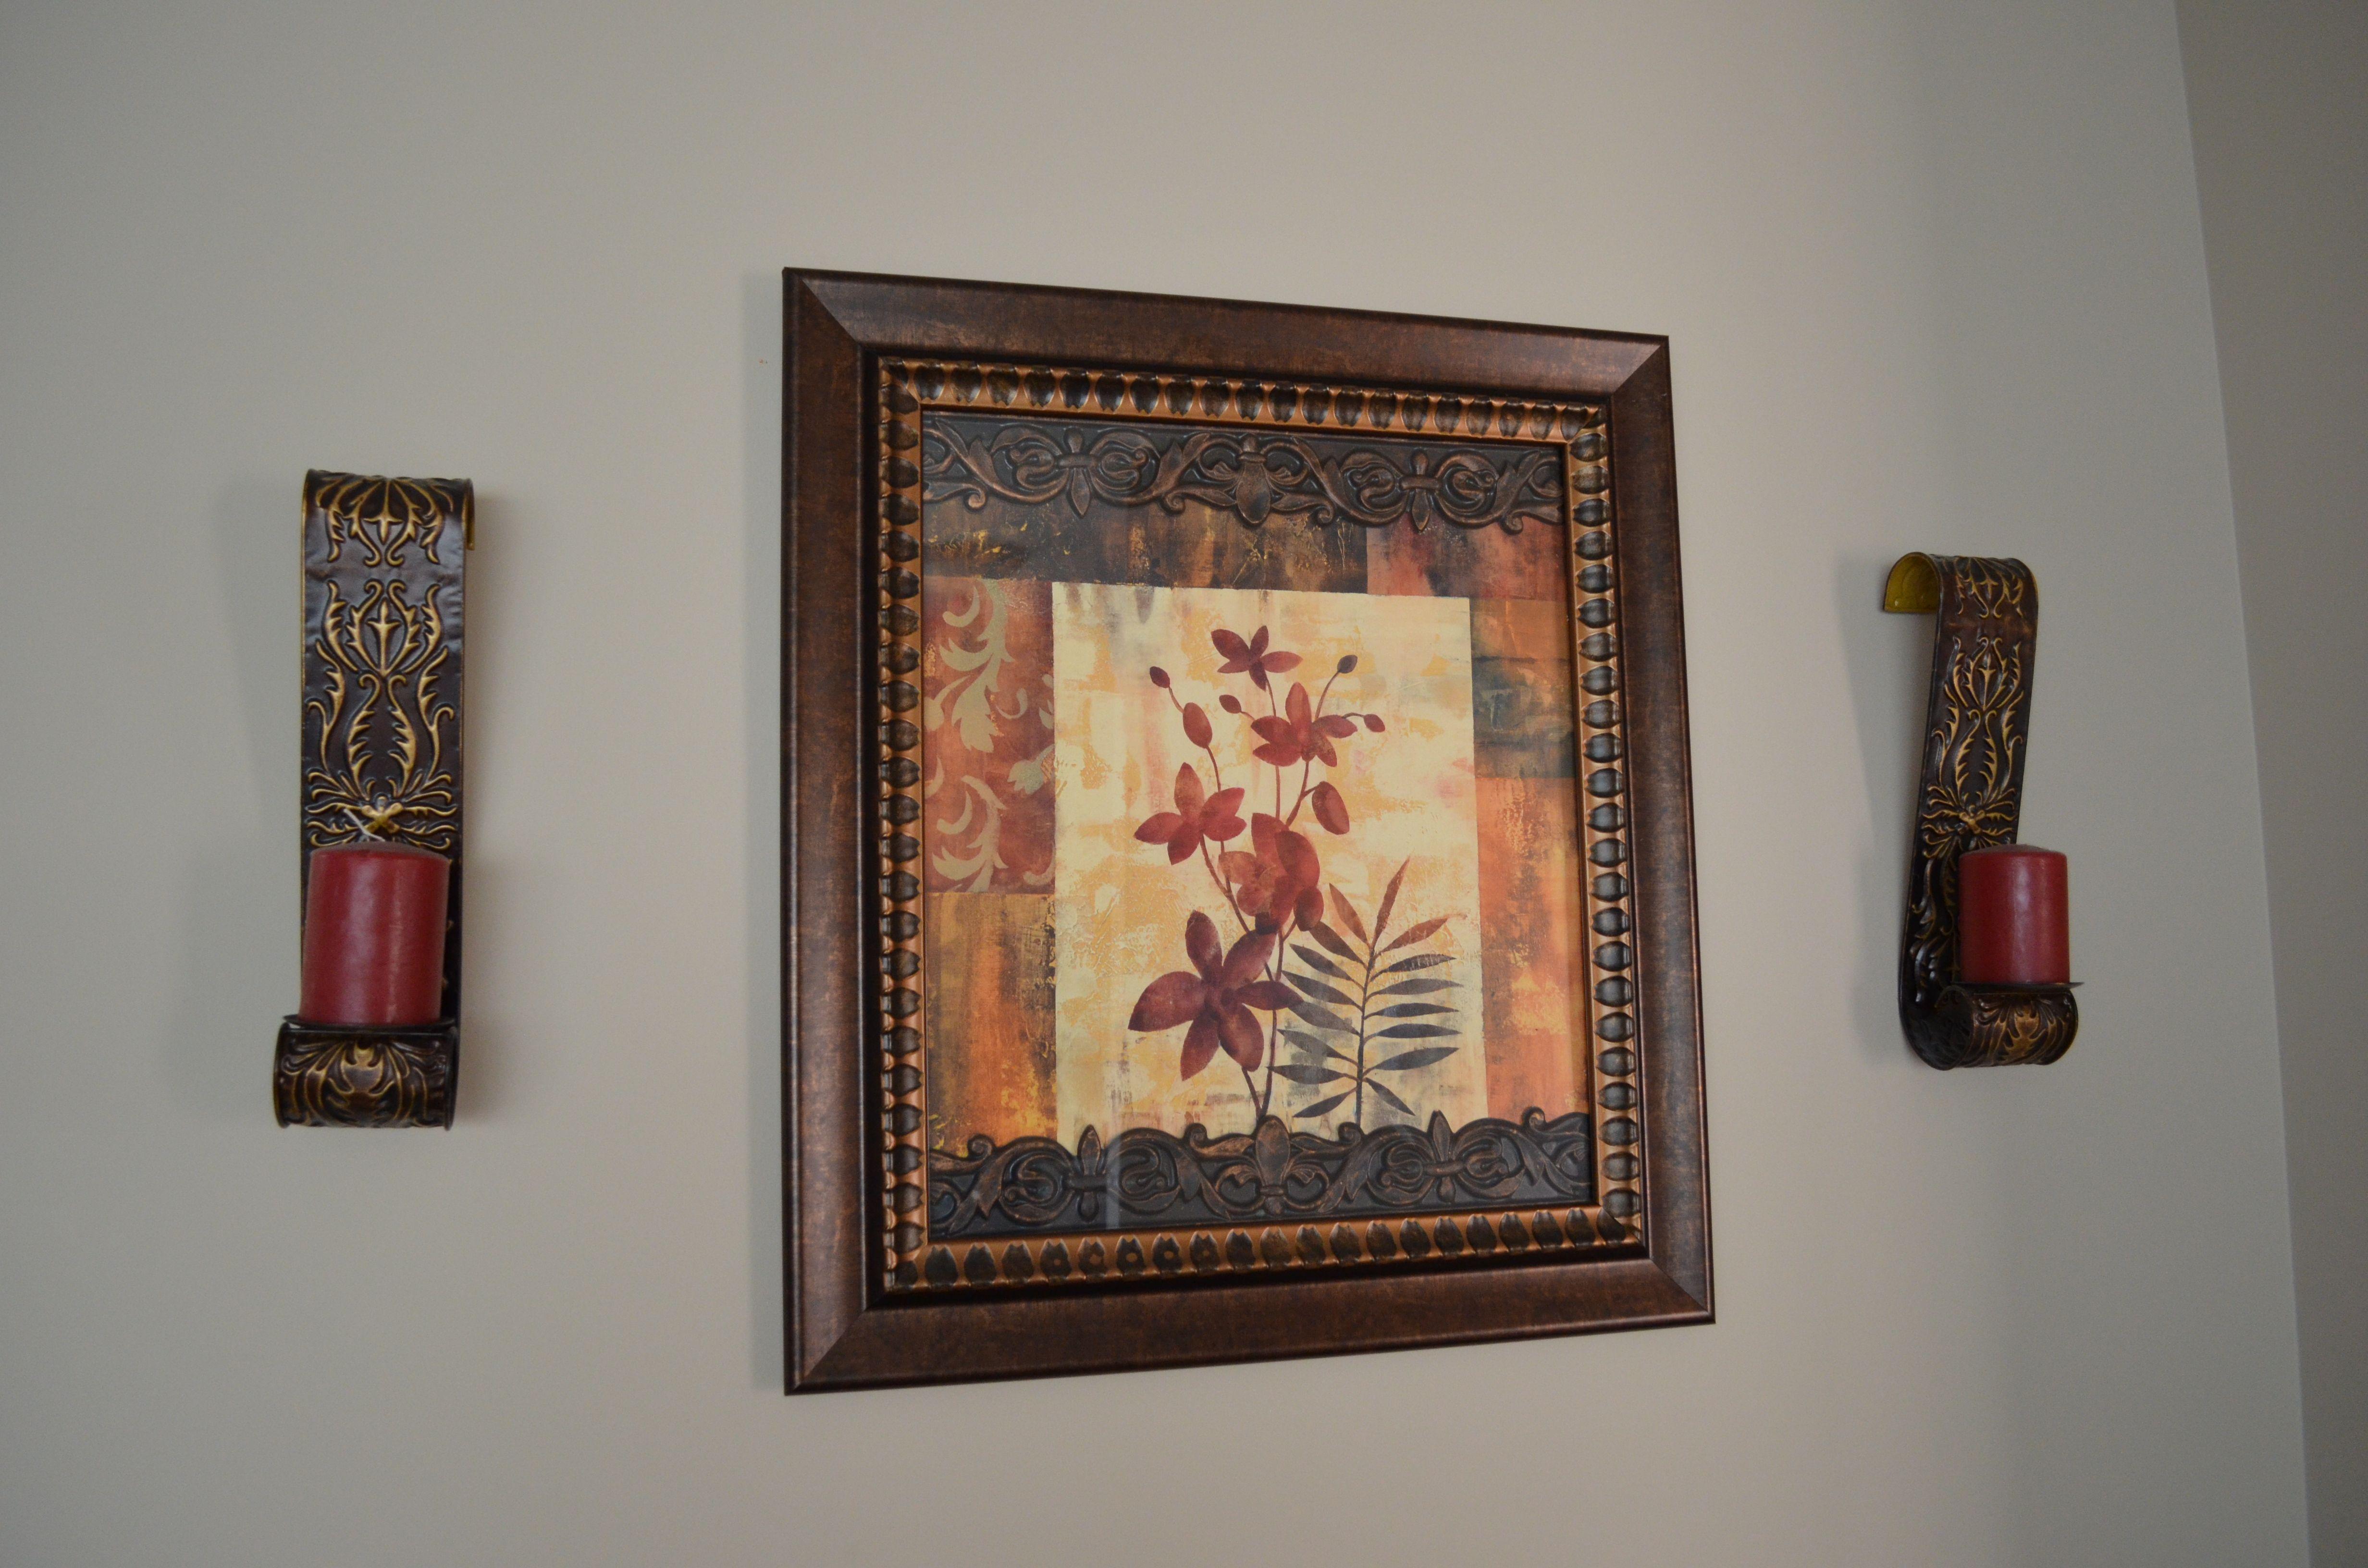 I love this from Kirkland's Home | Kirkland home decor ... on Kirkland's Decor Home Accents id=43306